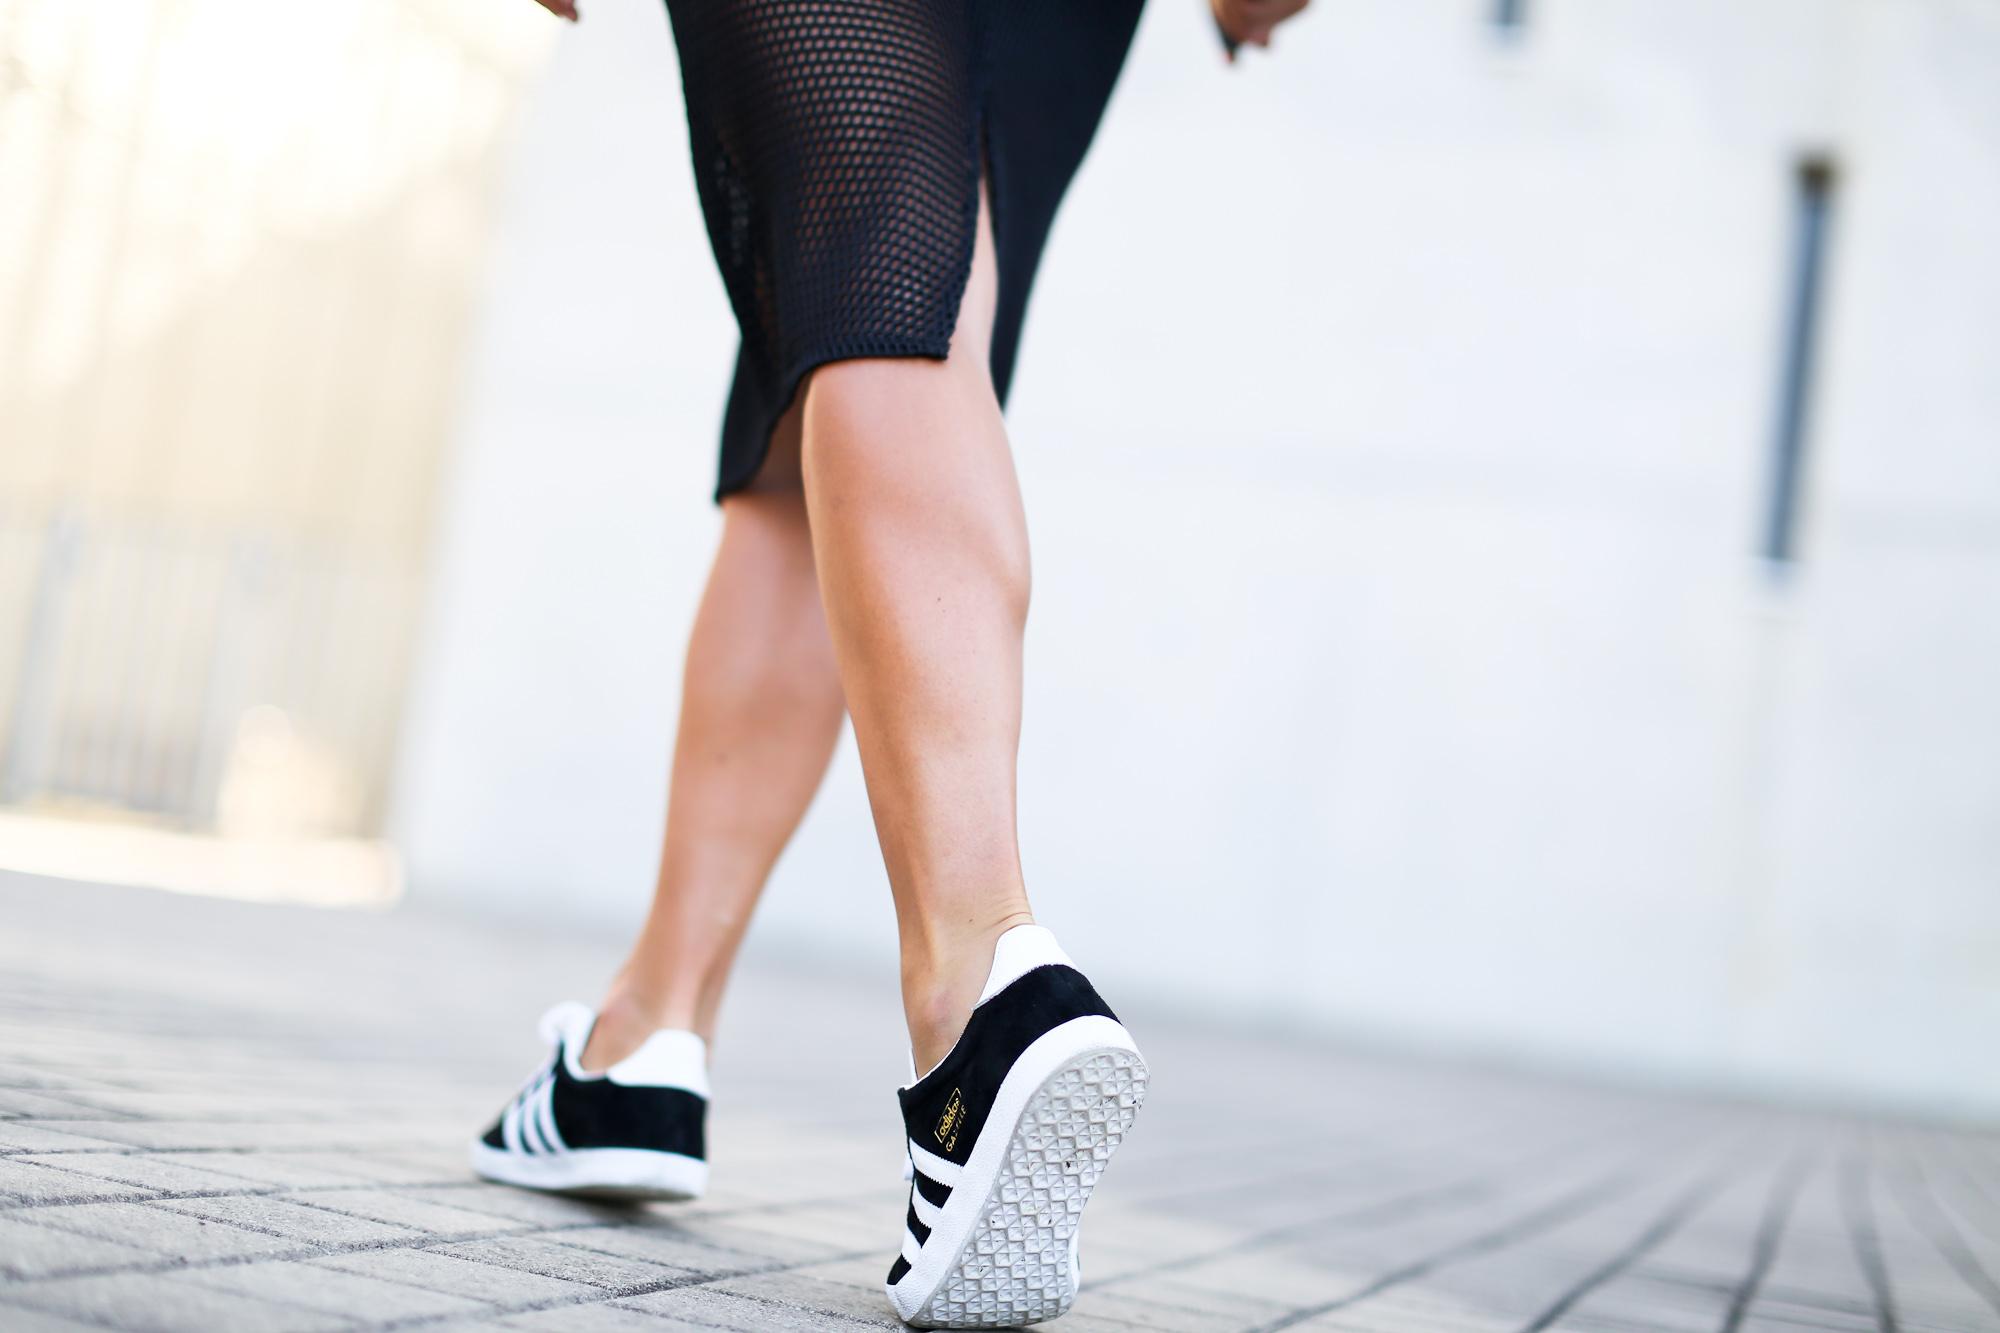 Clochet_streetstyle_adidas_gazelle_black_leztinstreet_celine_paris_clutch-5